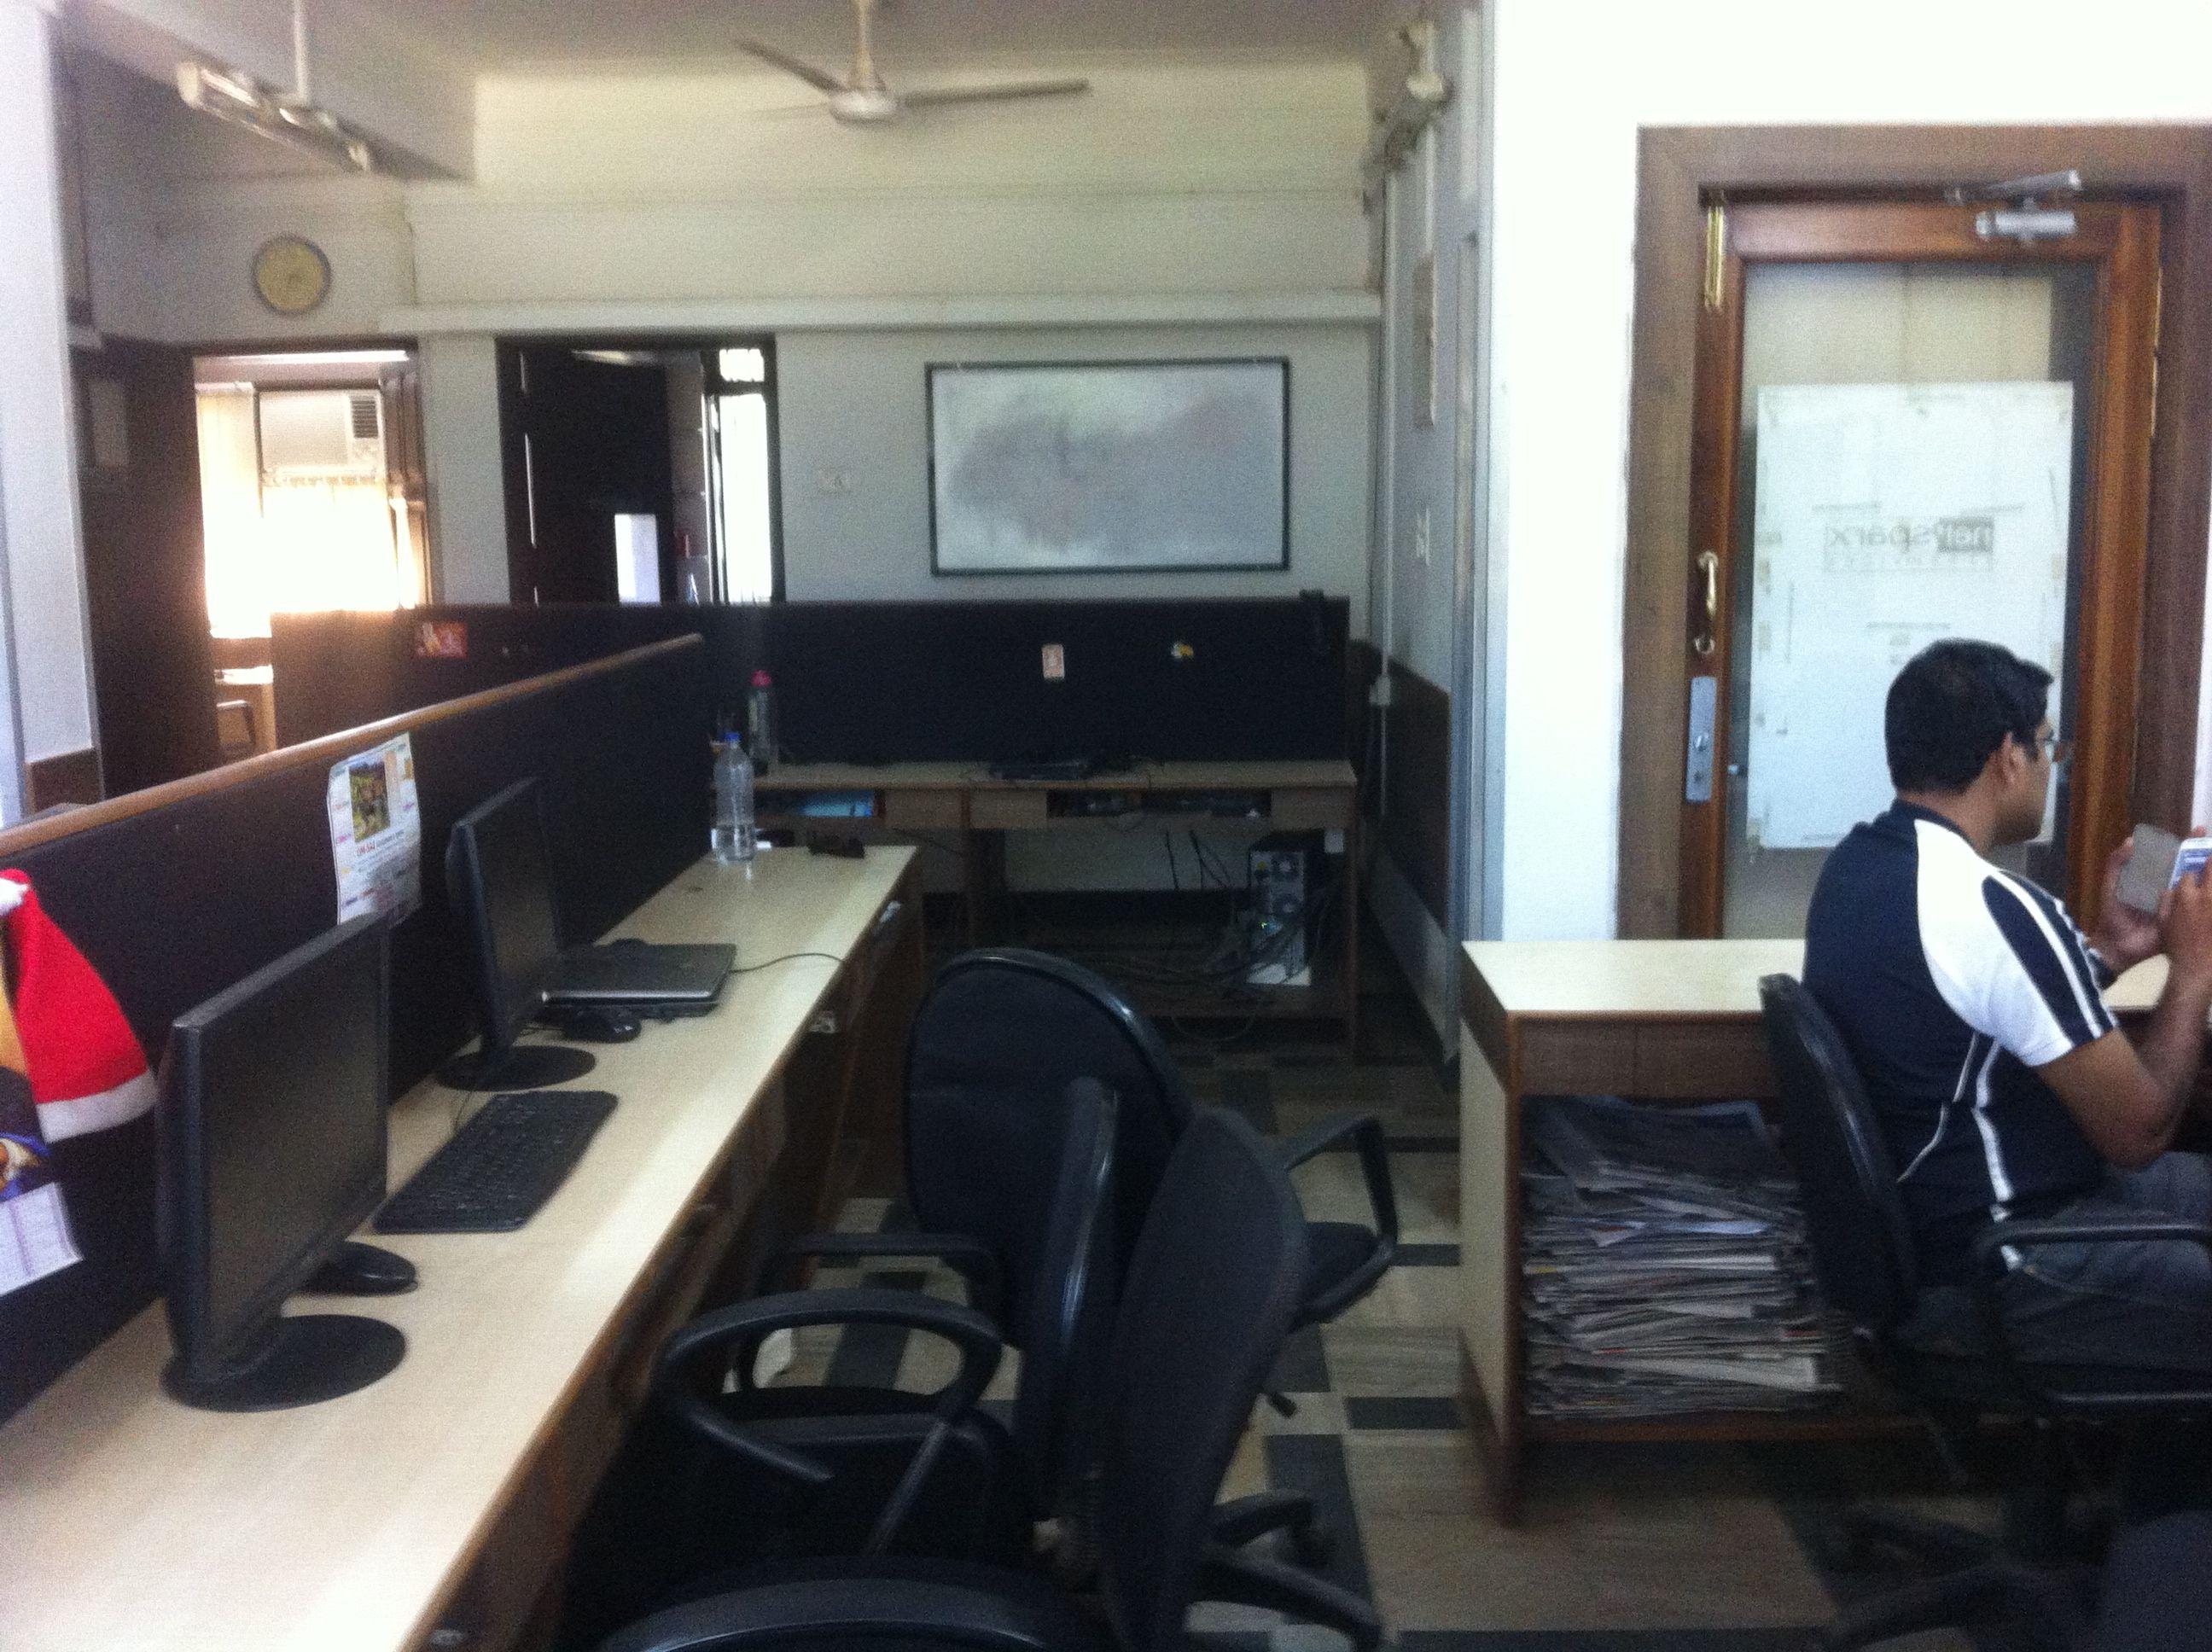 Quagnitia Systems Pvt Ltd in Pune Mahārāshtra